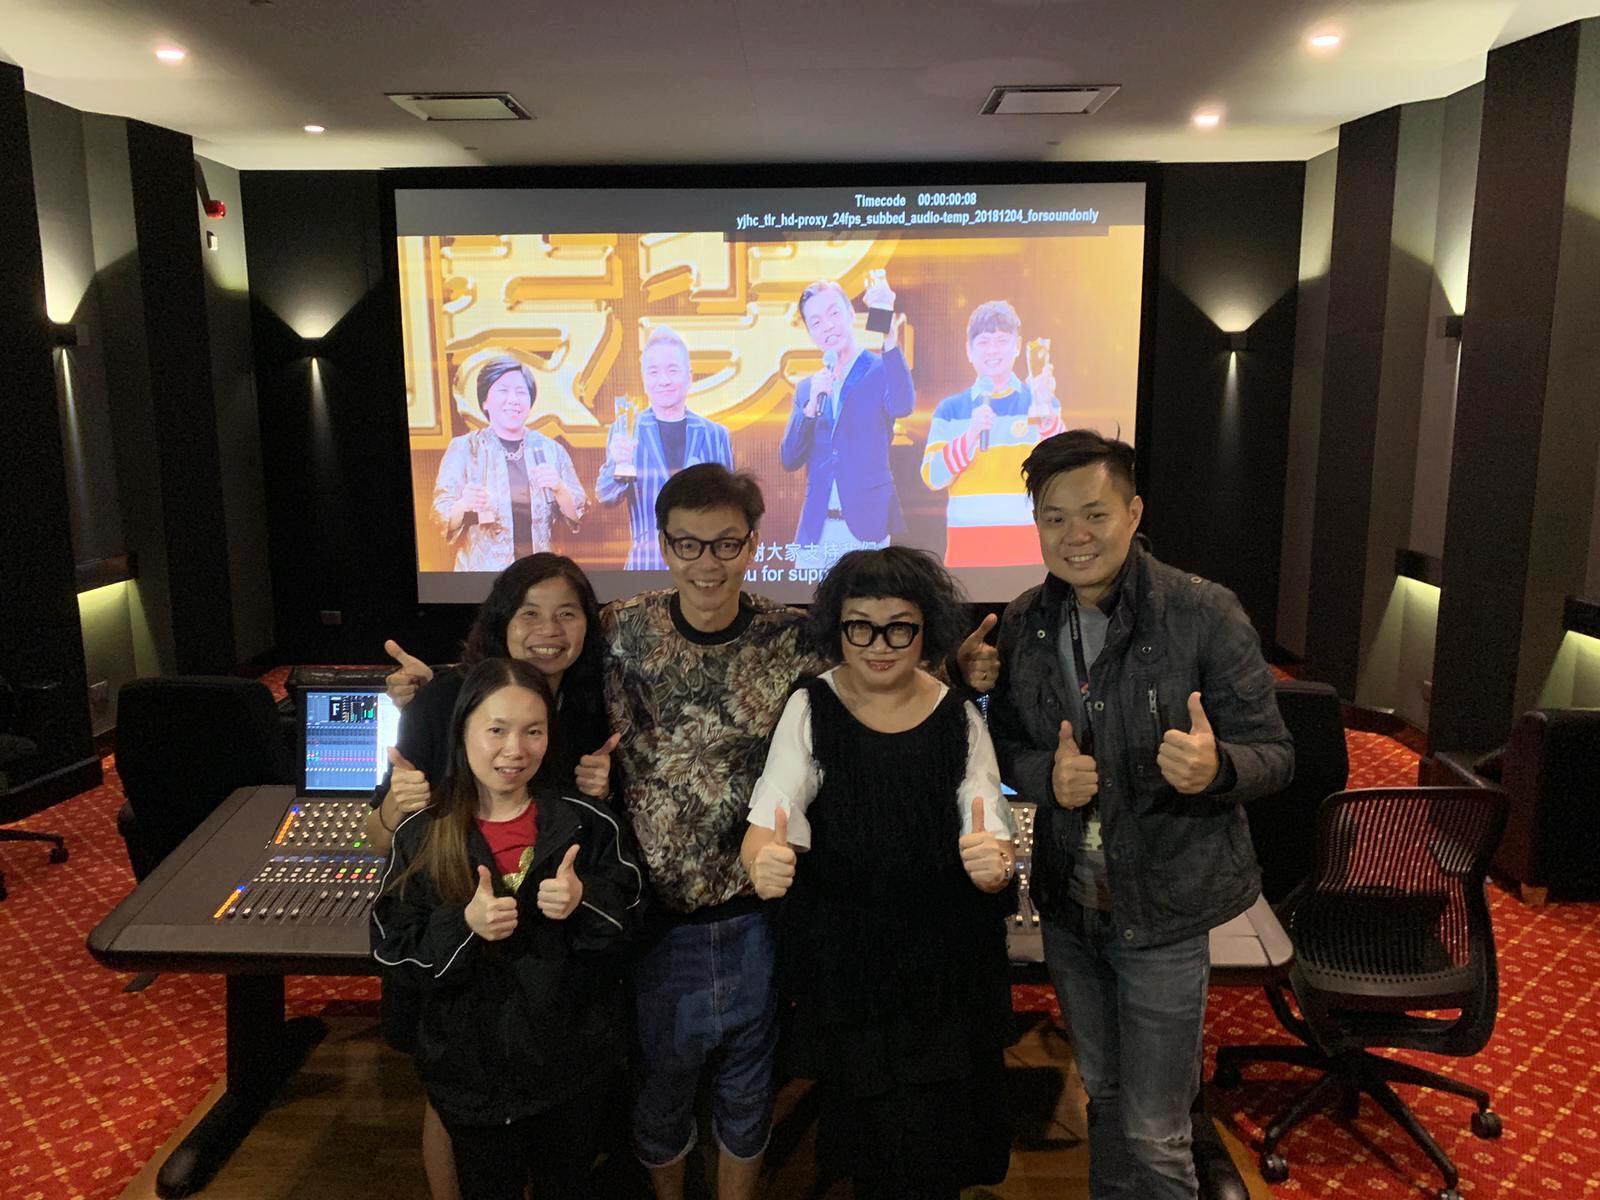 Director Mark Lee with Team of Mediacorp Audio Post, Music & Sound Effects Director Mo Ju Li, Sound Designers Li Shen, Mei Han & Chin Liang.